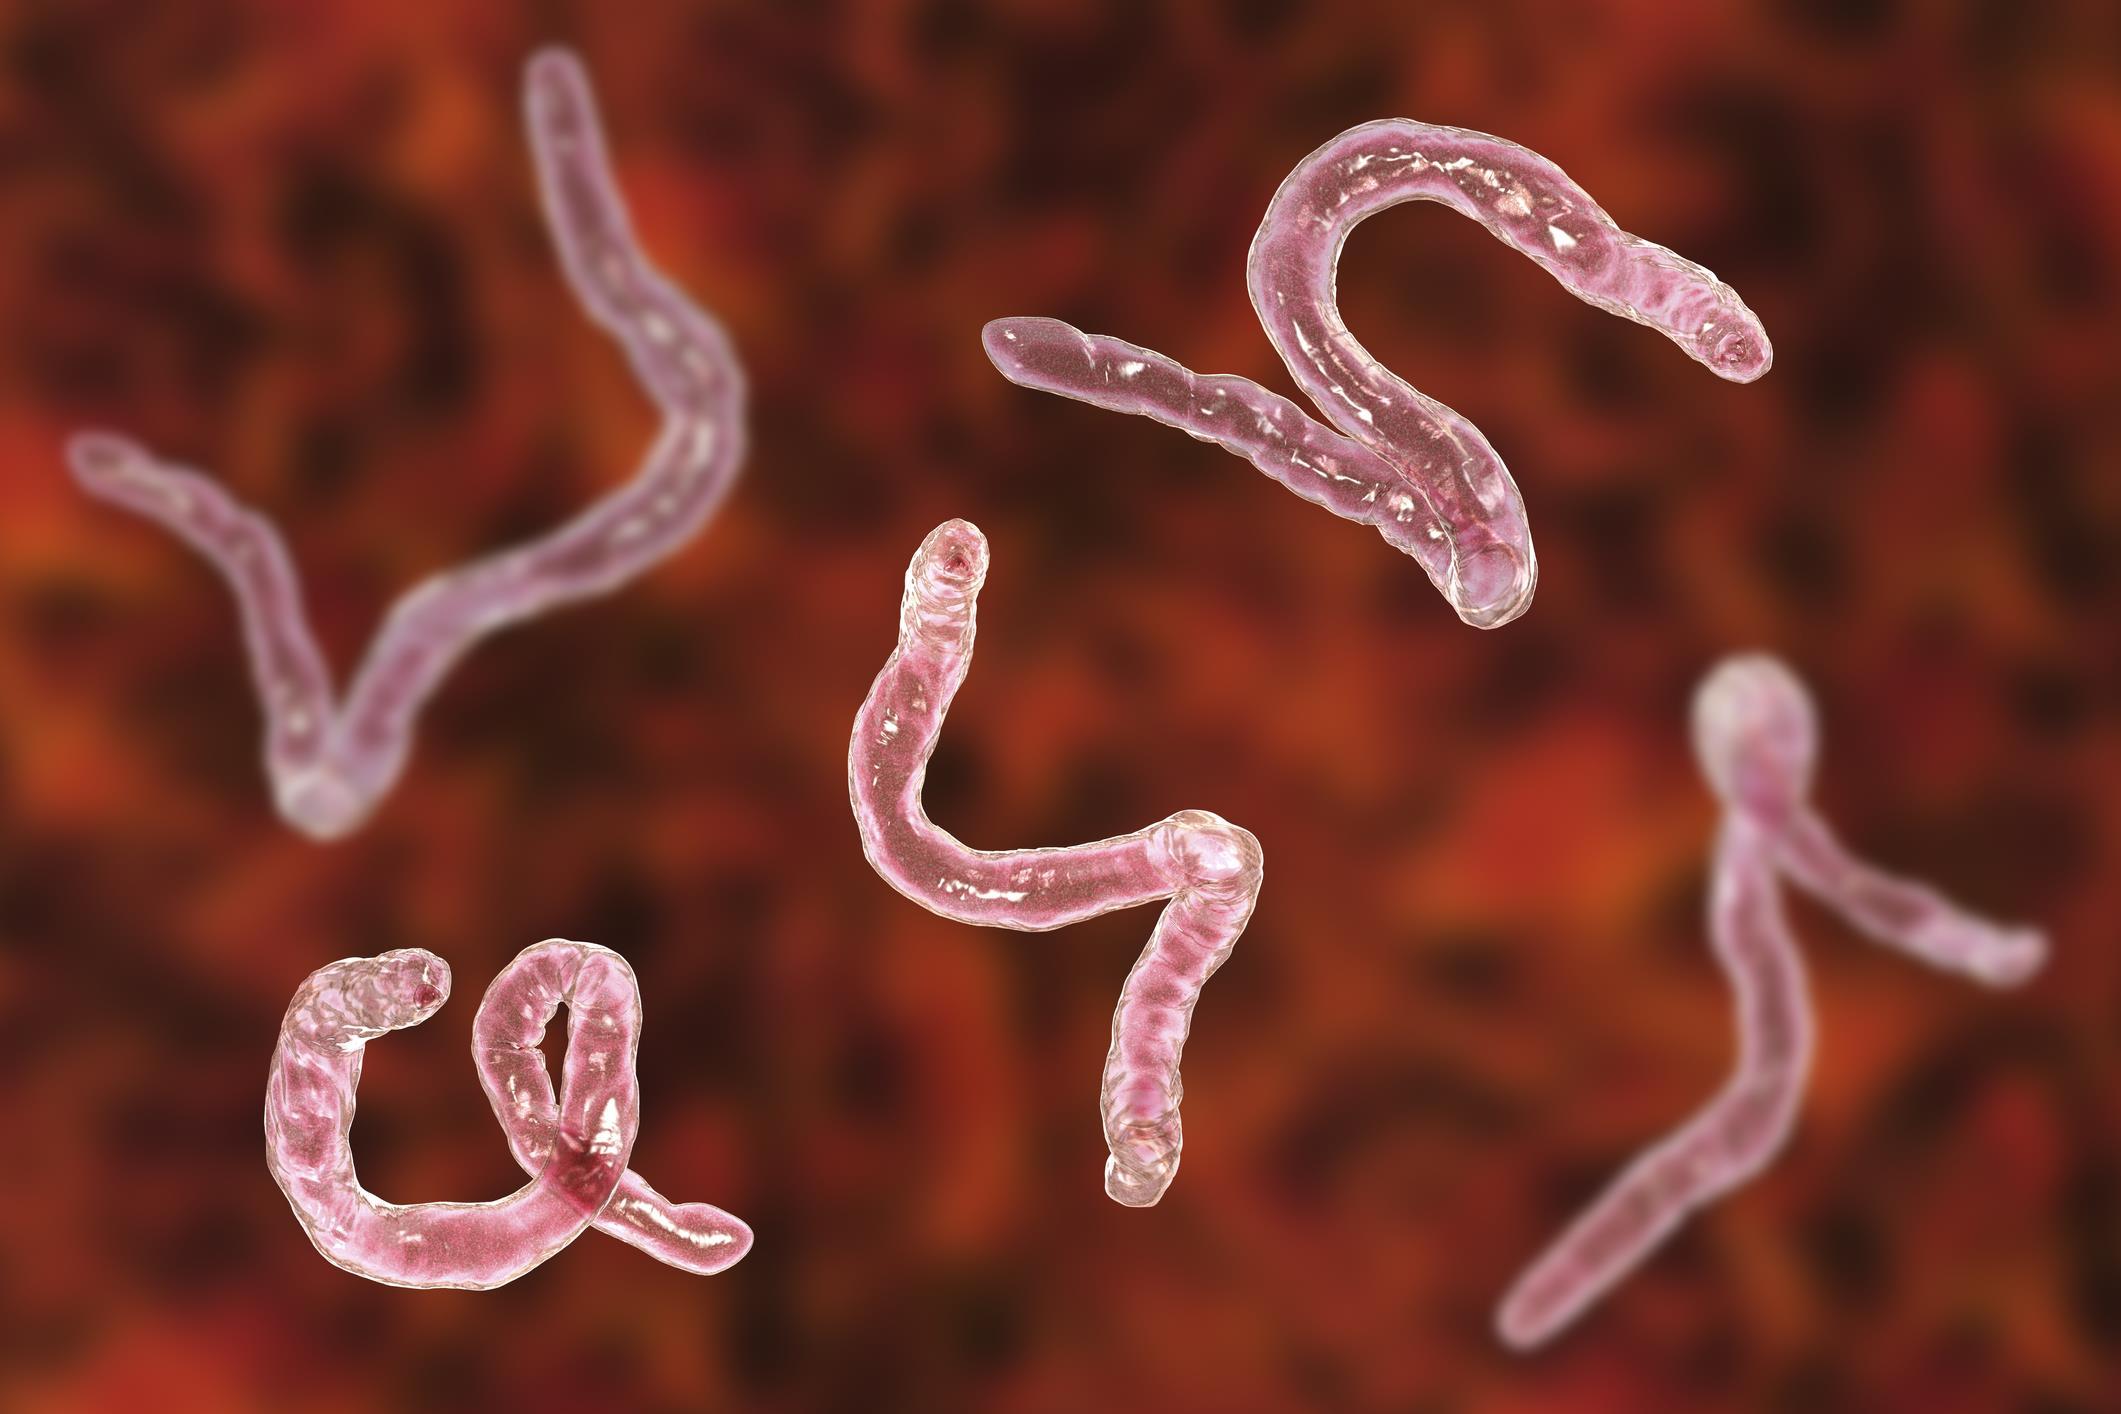 Giardia u ludzi. Lamblia metoda, vaši črvi so v redu